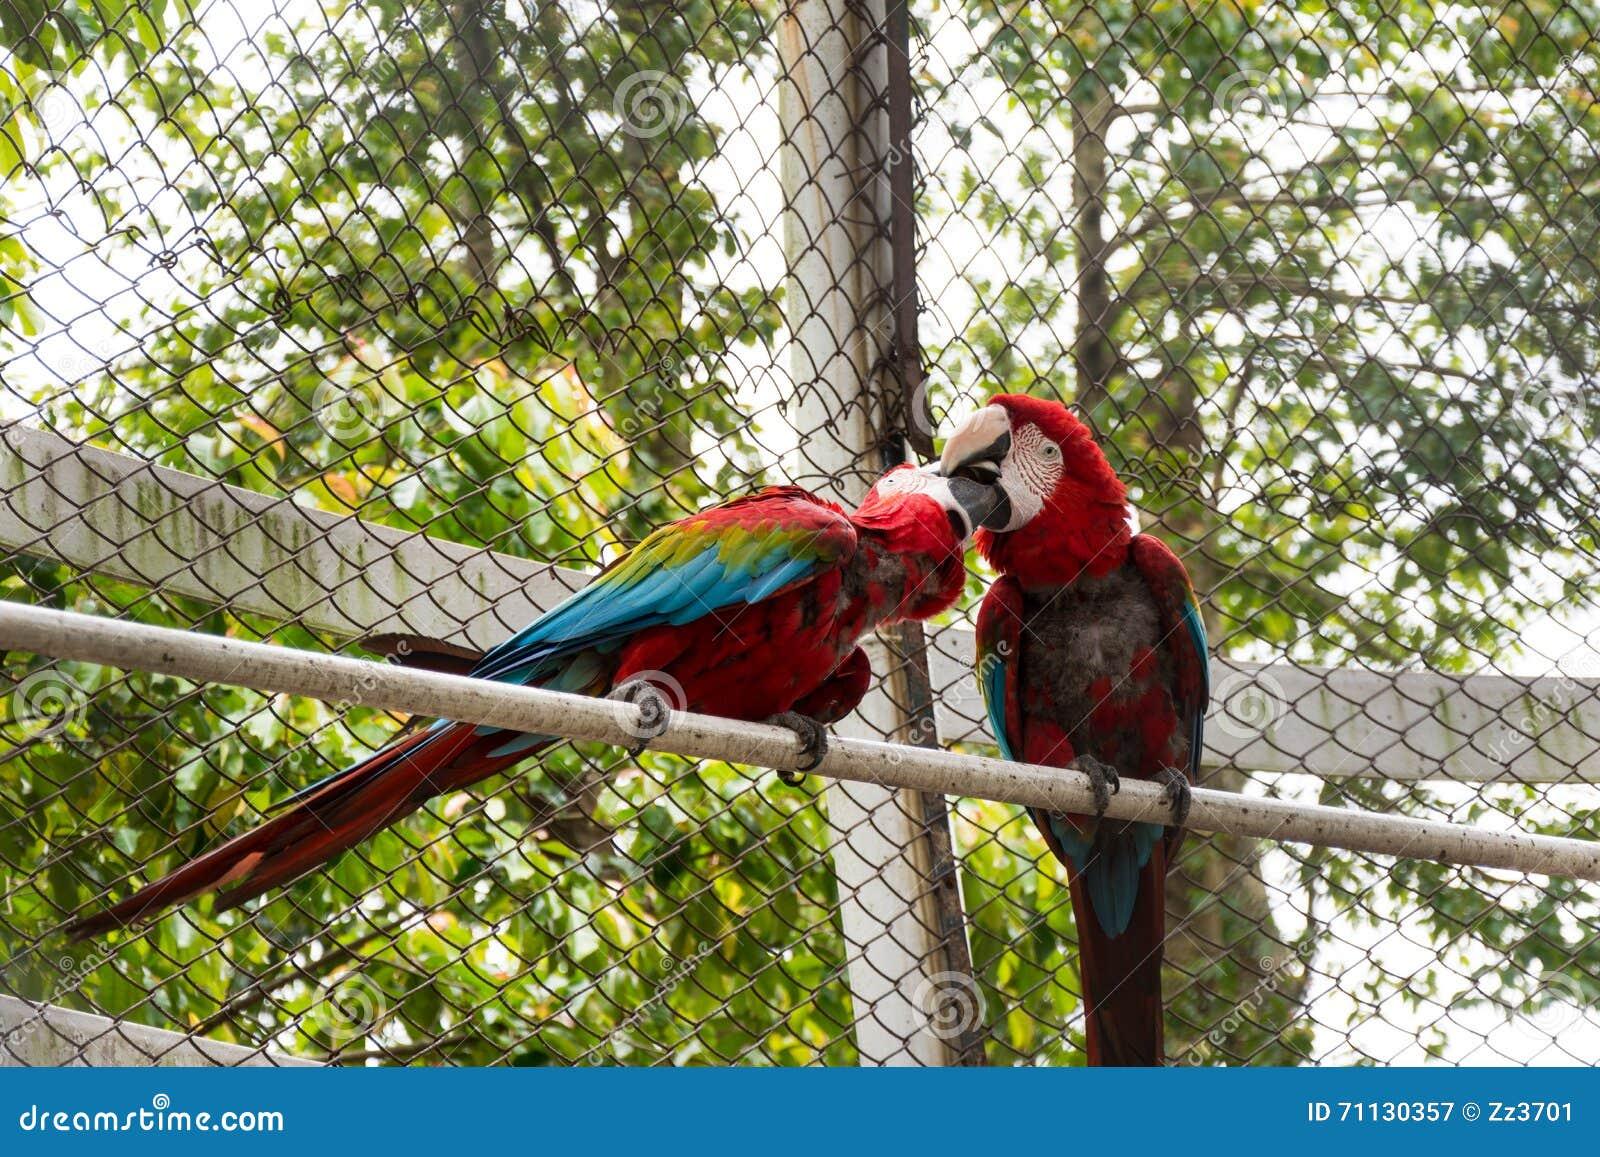 Two parrots kissing